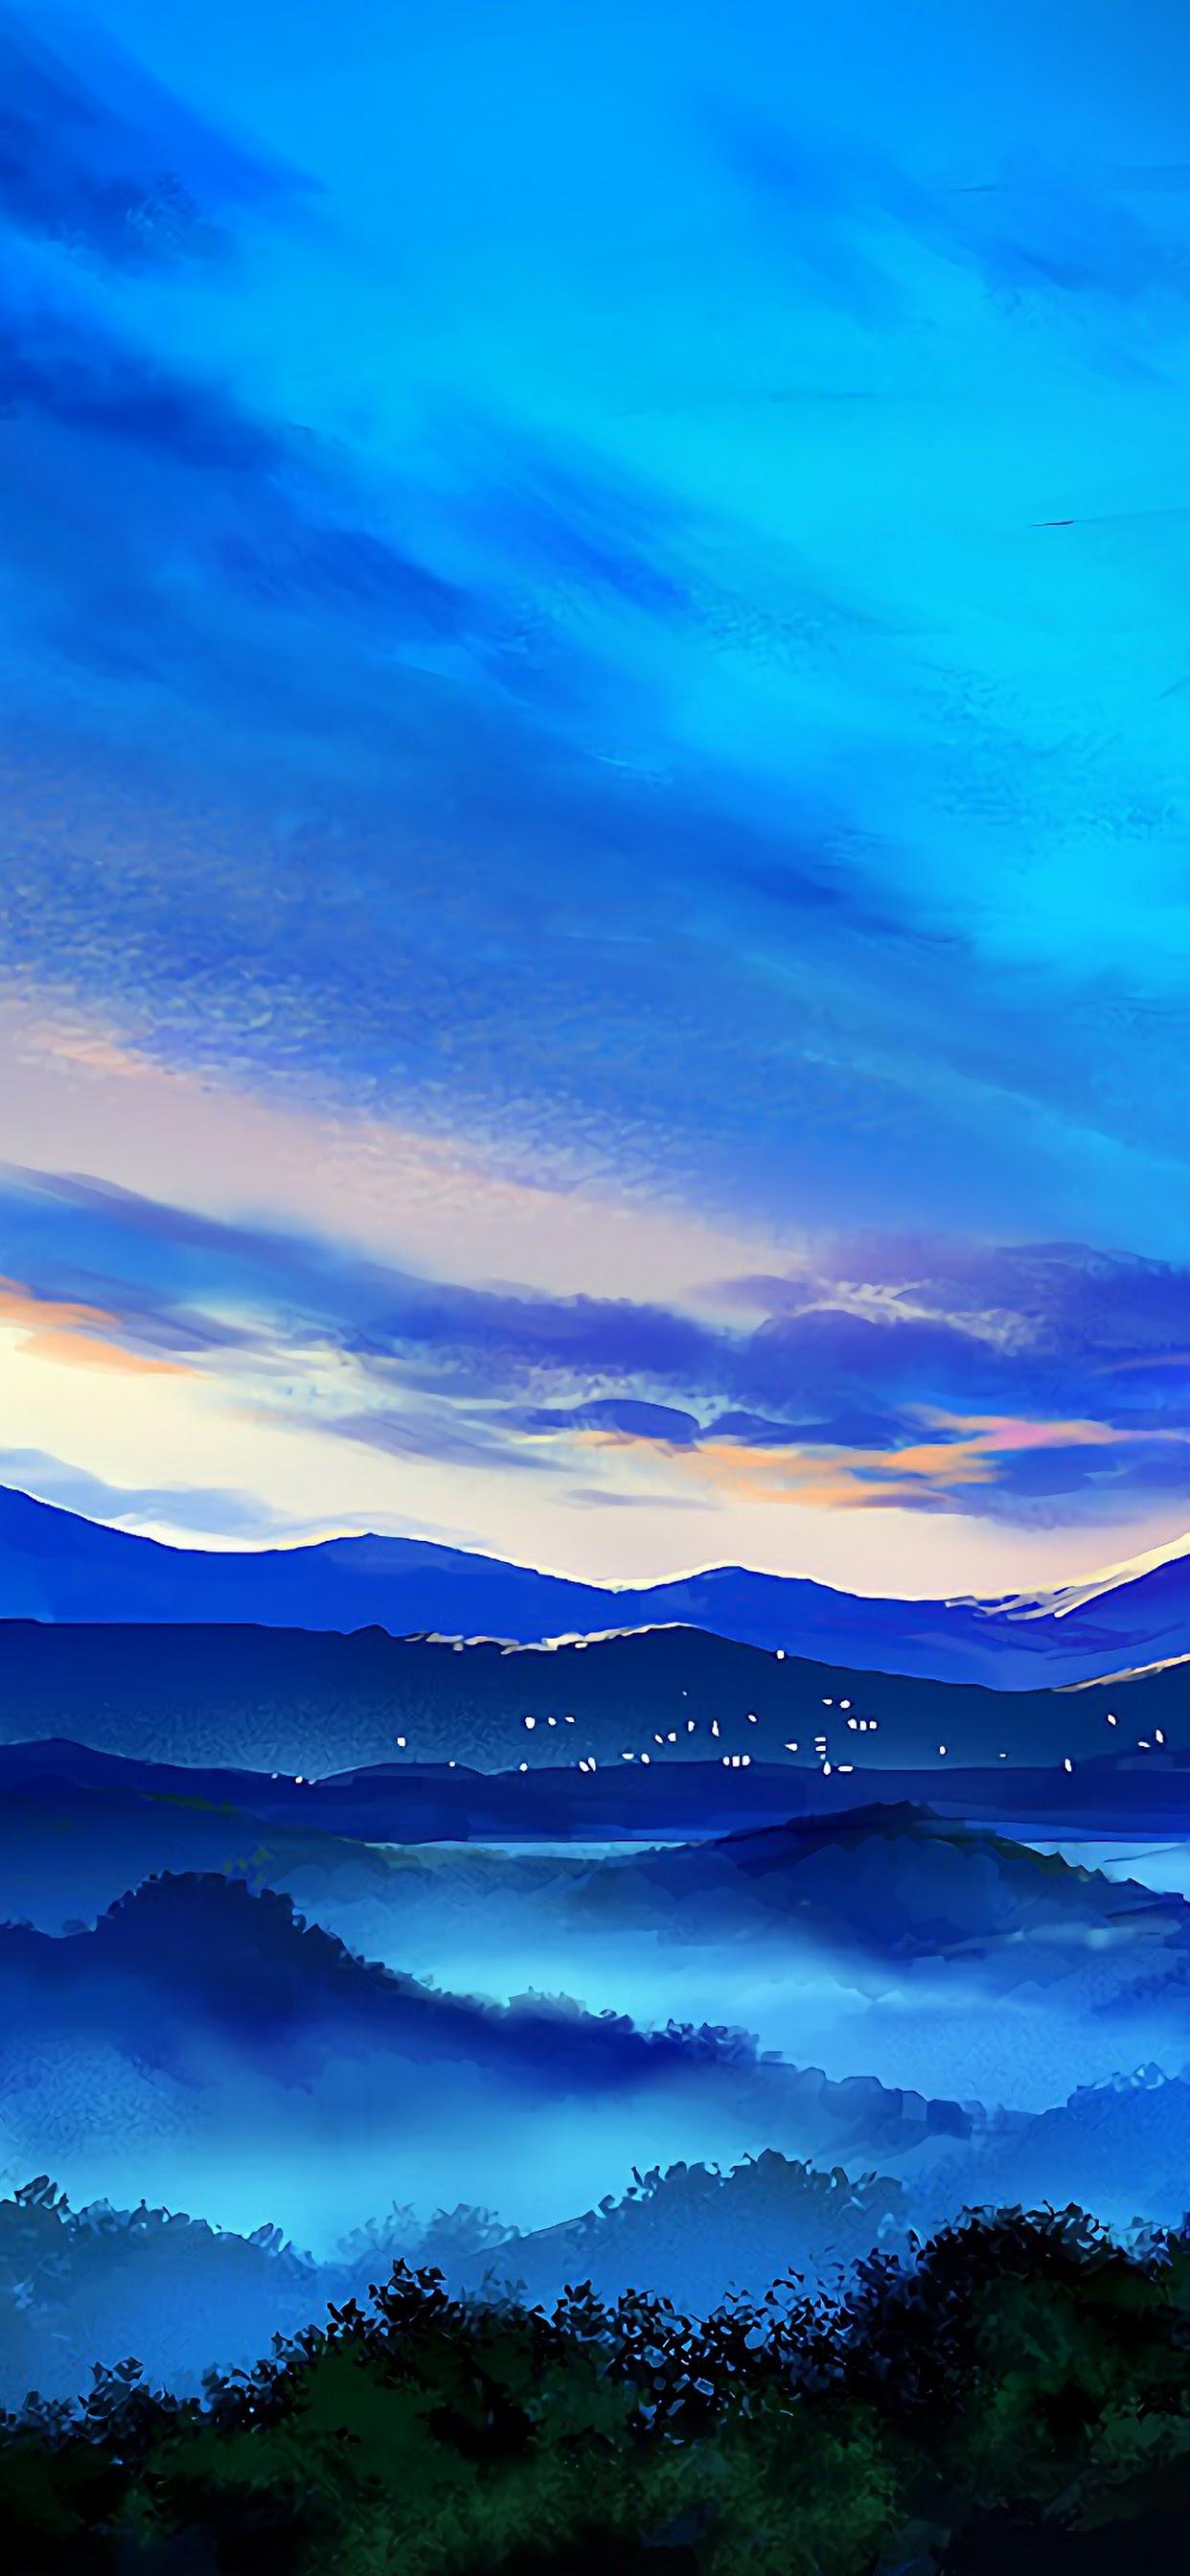 Anime Mountain Landscape Sunrise Scenery 4k Wallpaper 96